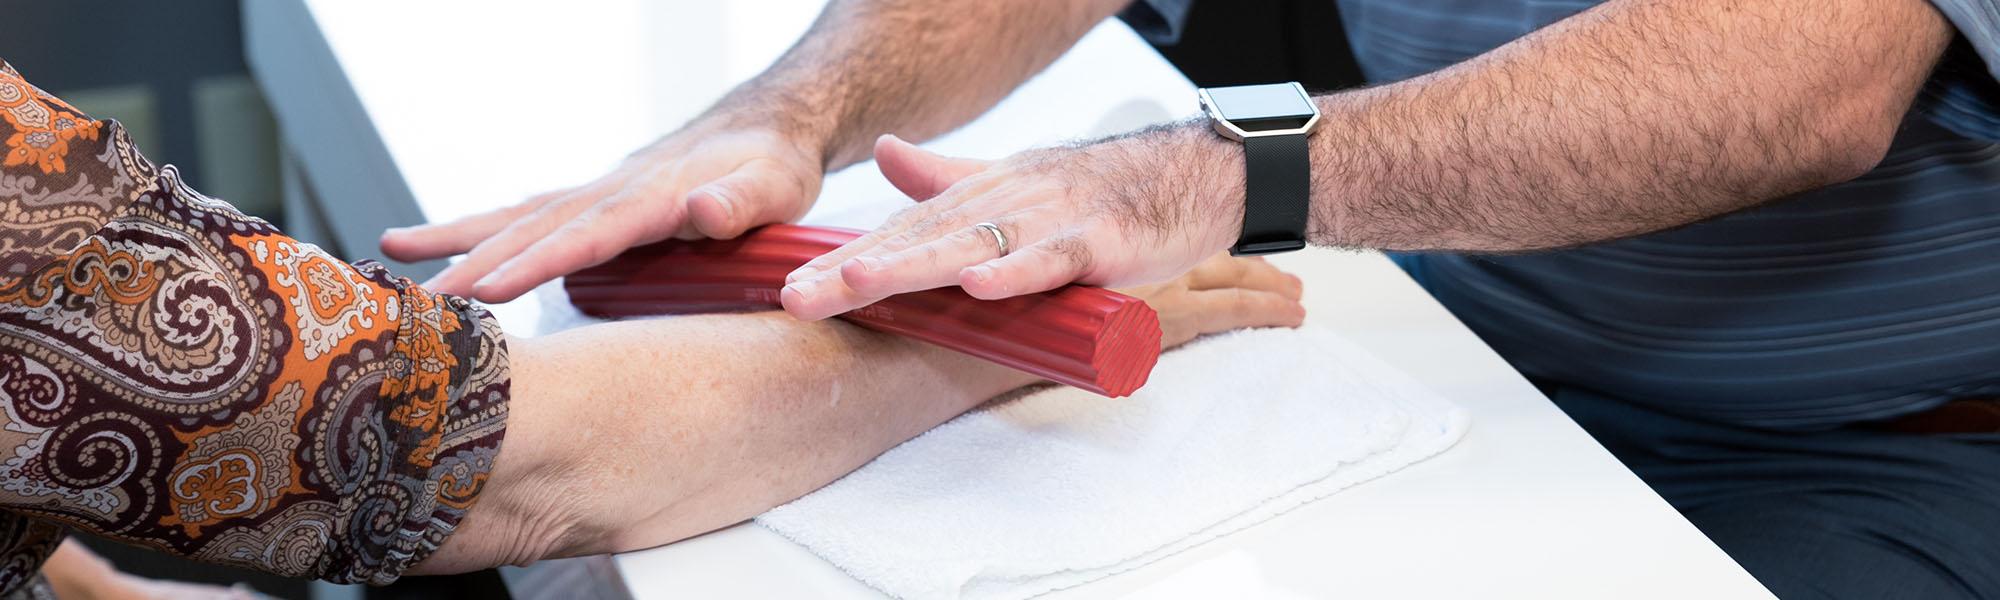 Forearm Pain Treatment